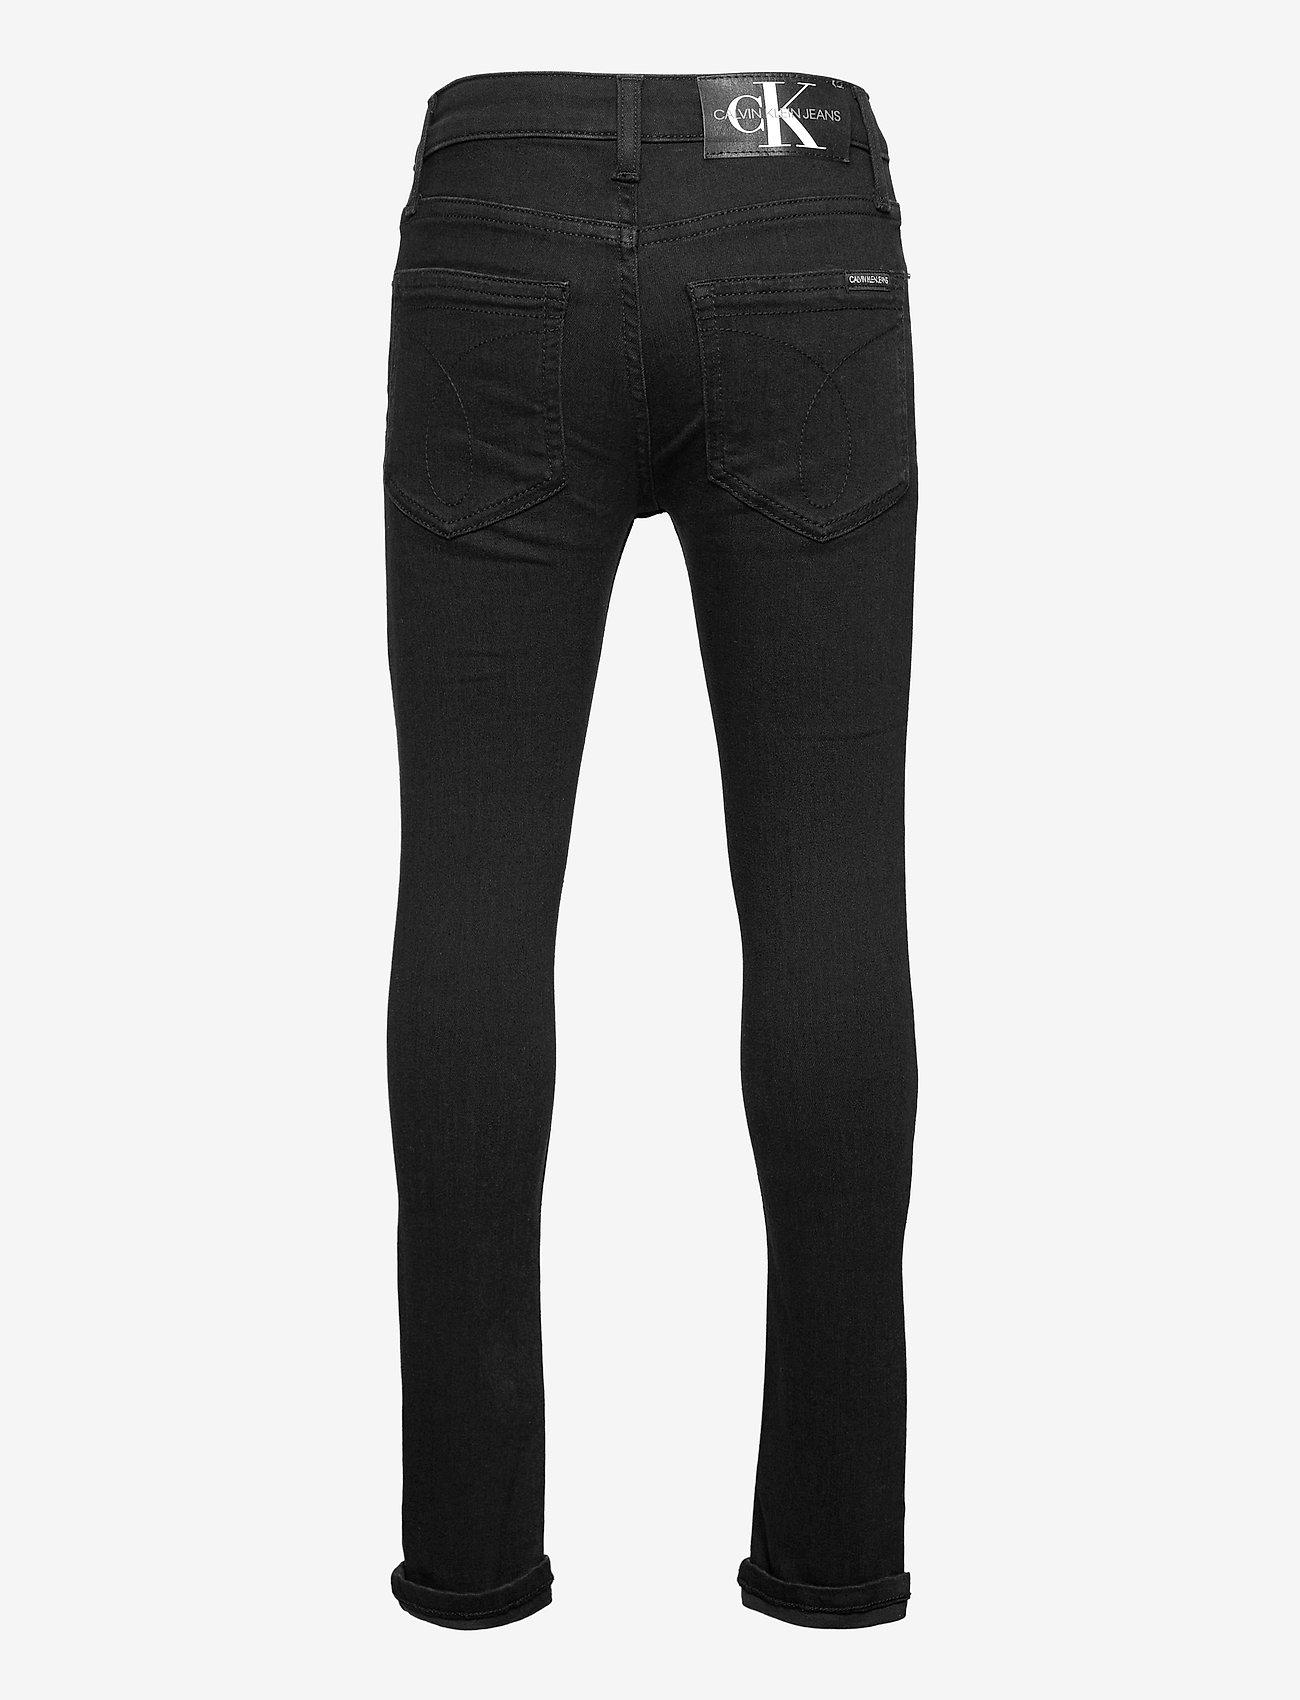 Calvin Klein - SKINNY CL BLK STR - jeans - clean black stretch - 1